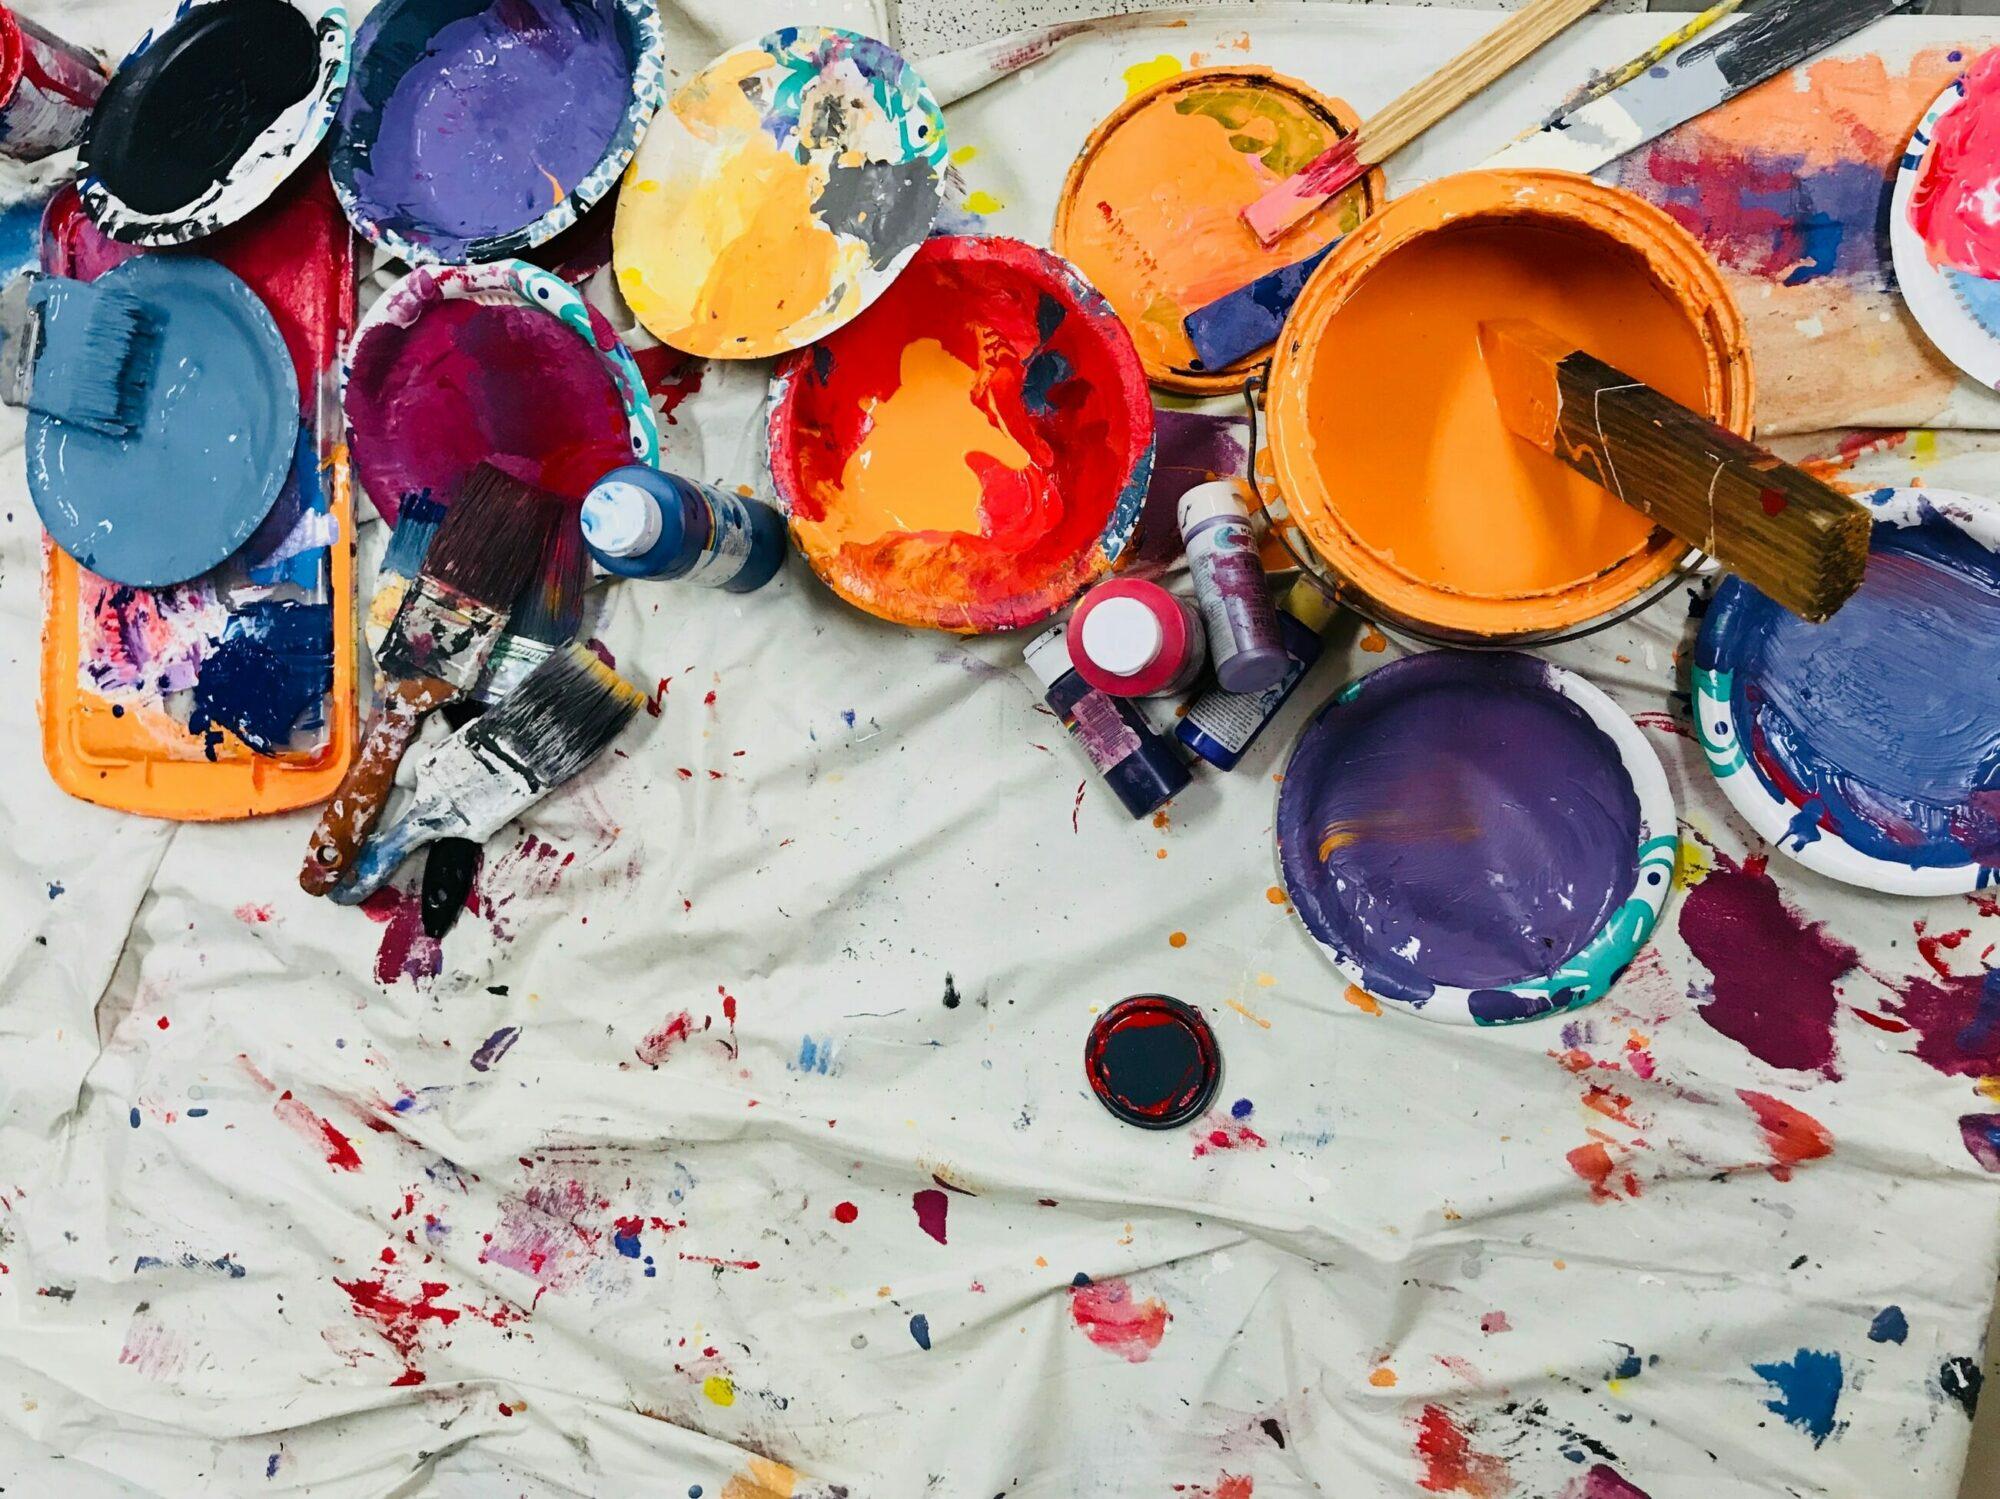 Je keuken schilderen en keukenkastjes verven